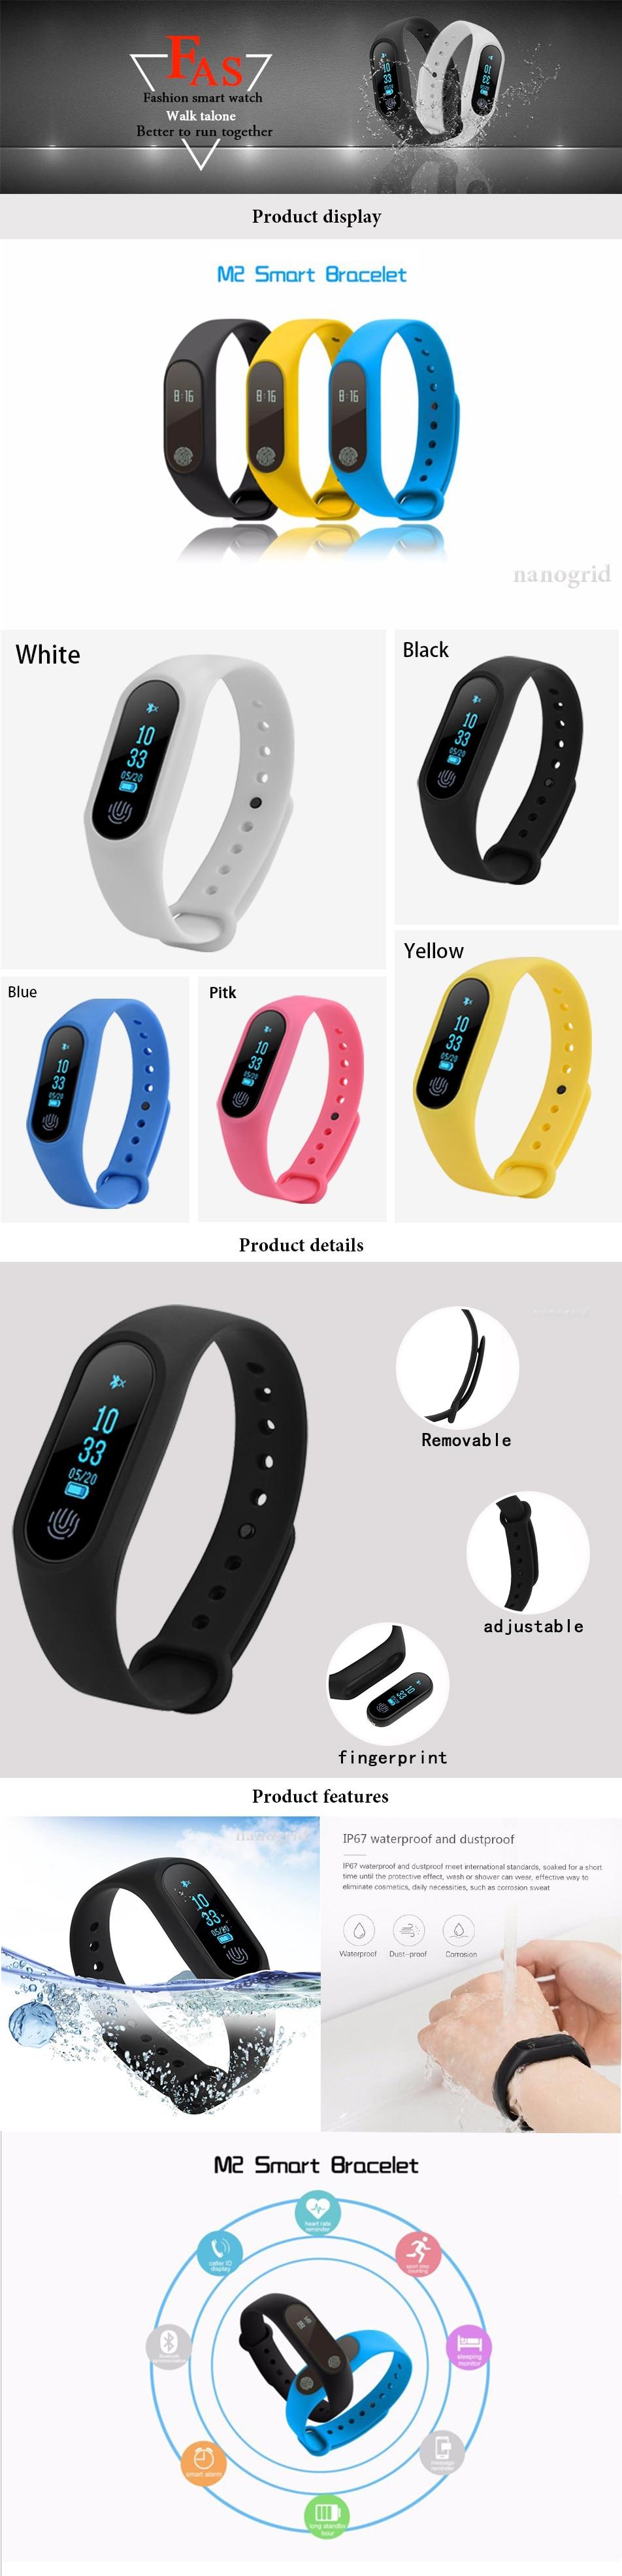 Smart Band Waterproof Band Heart Rate Monitor Smart Bracelet Fitness  Tracker Pedometer Wristband for Women Men Sport Watch